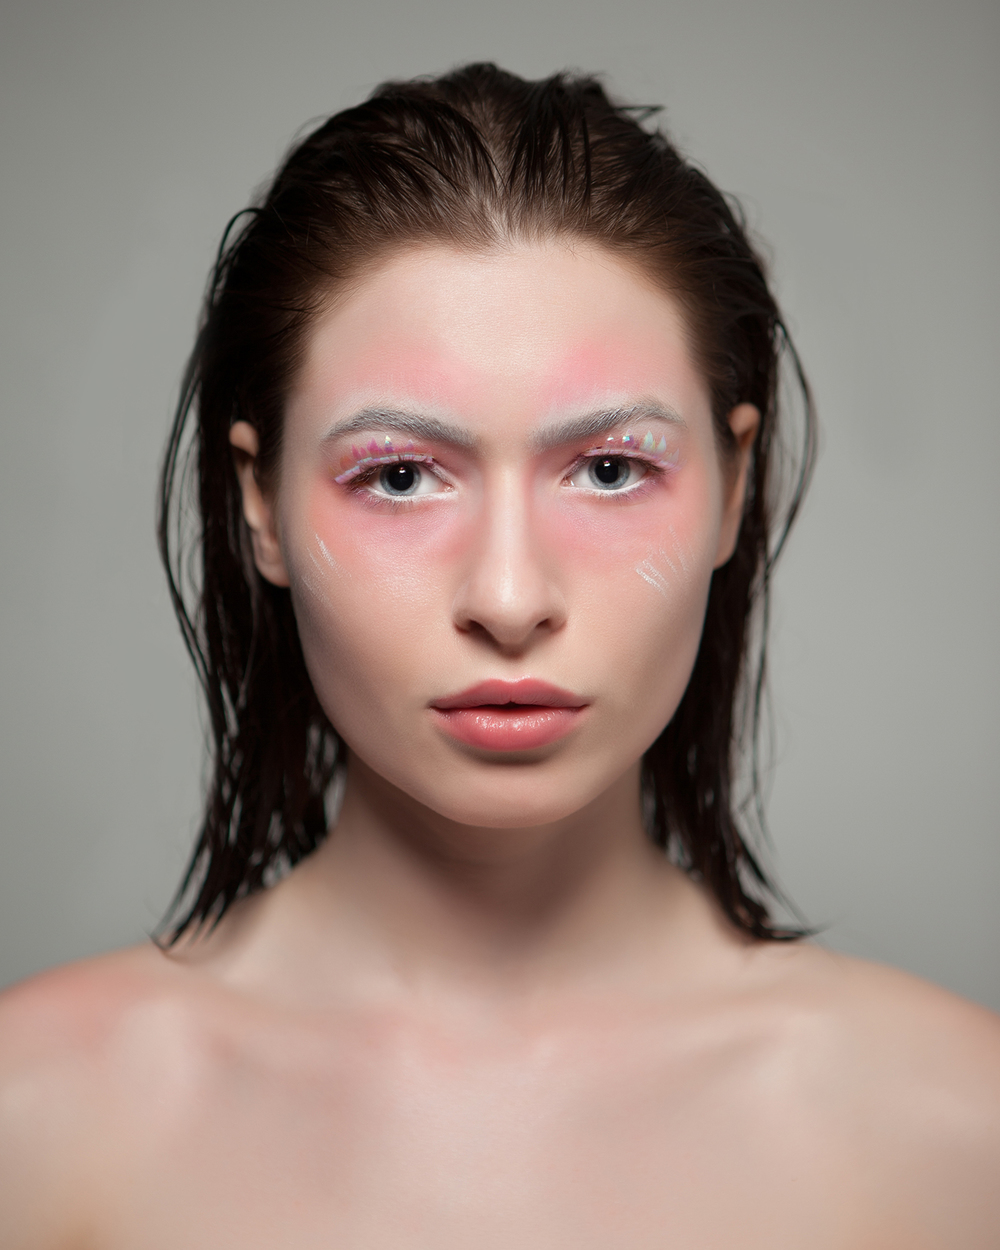 BeautyCAC1smaller.jpg